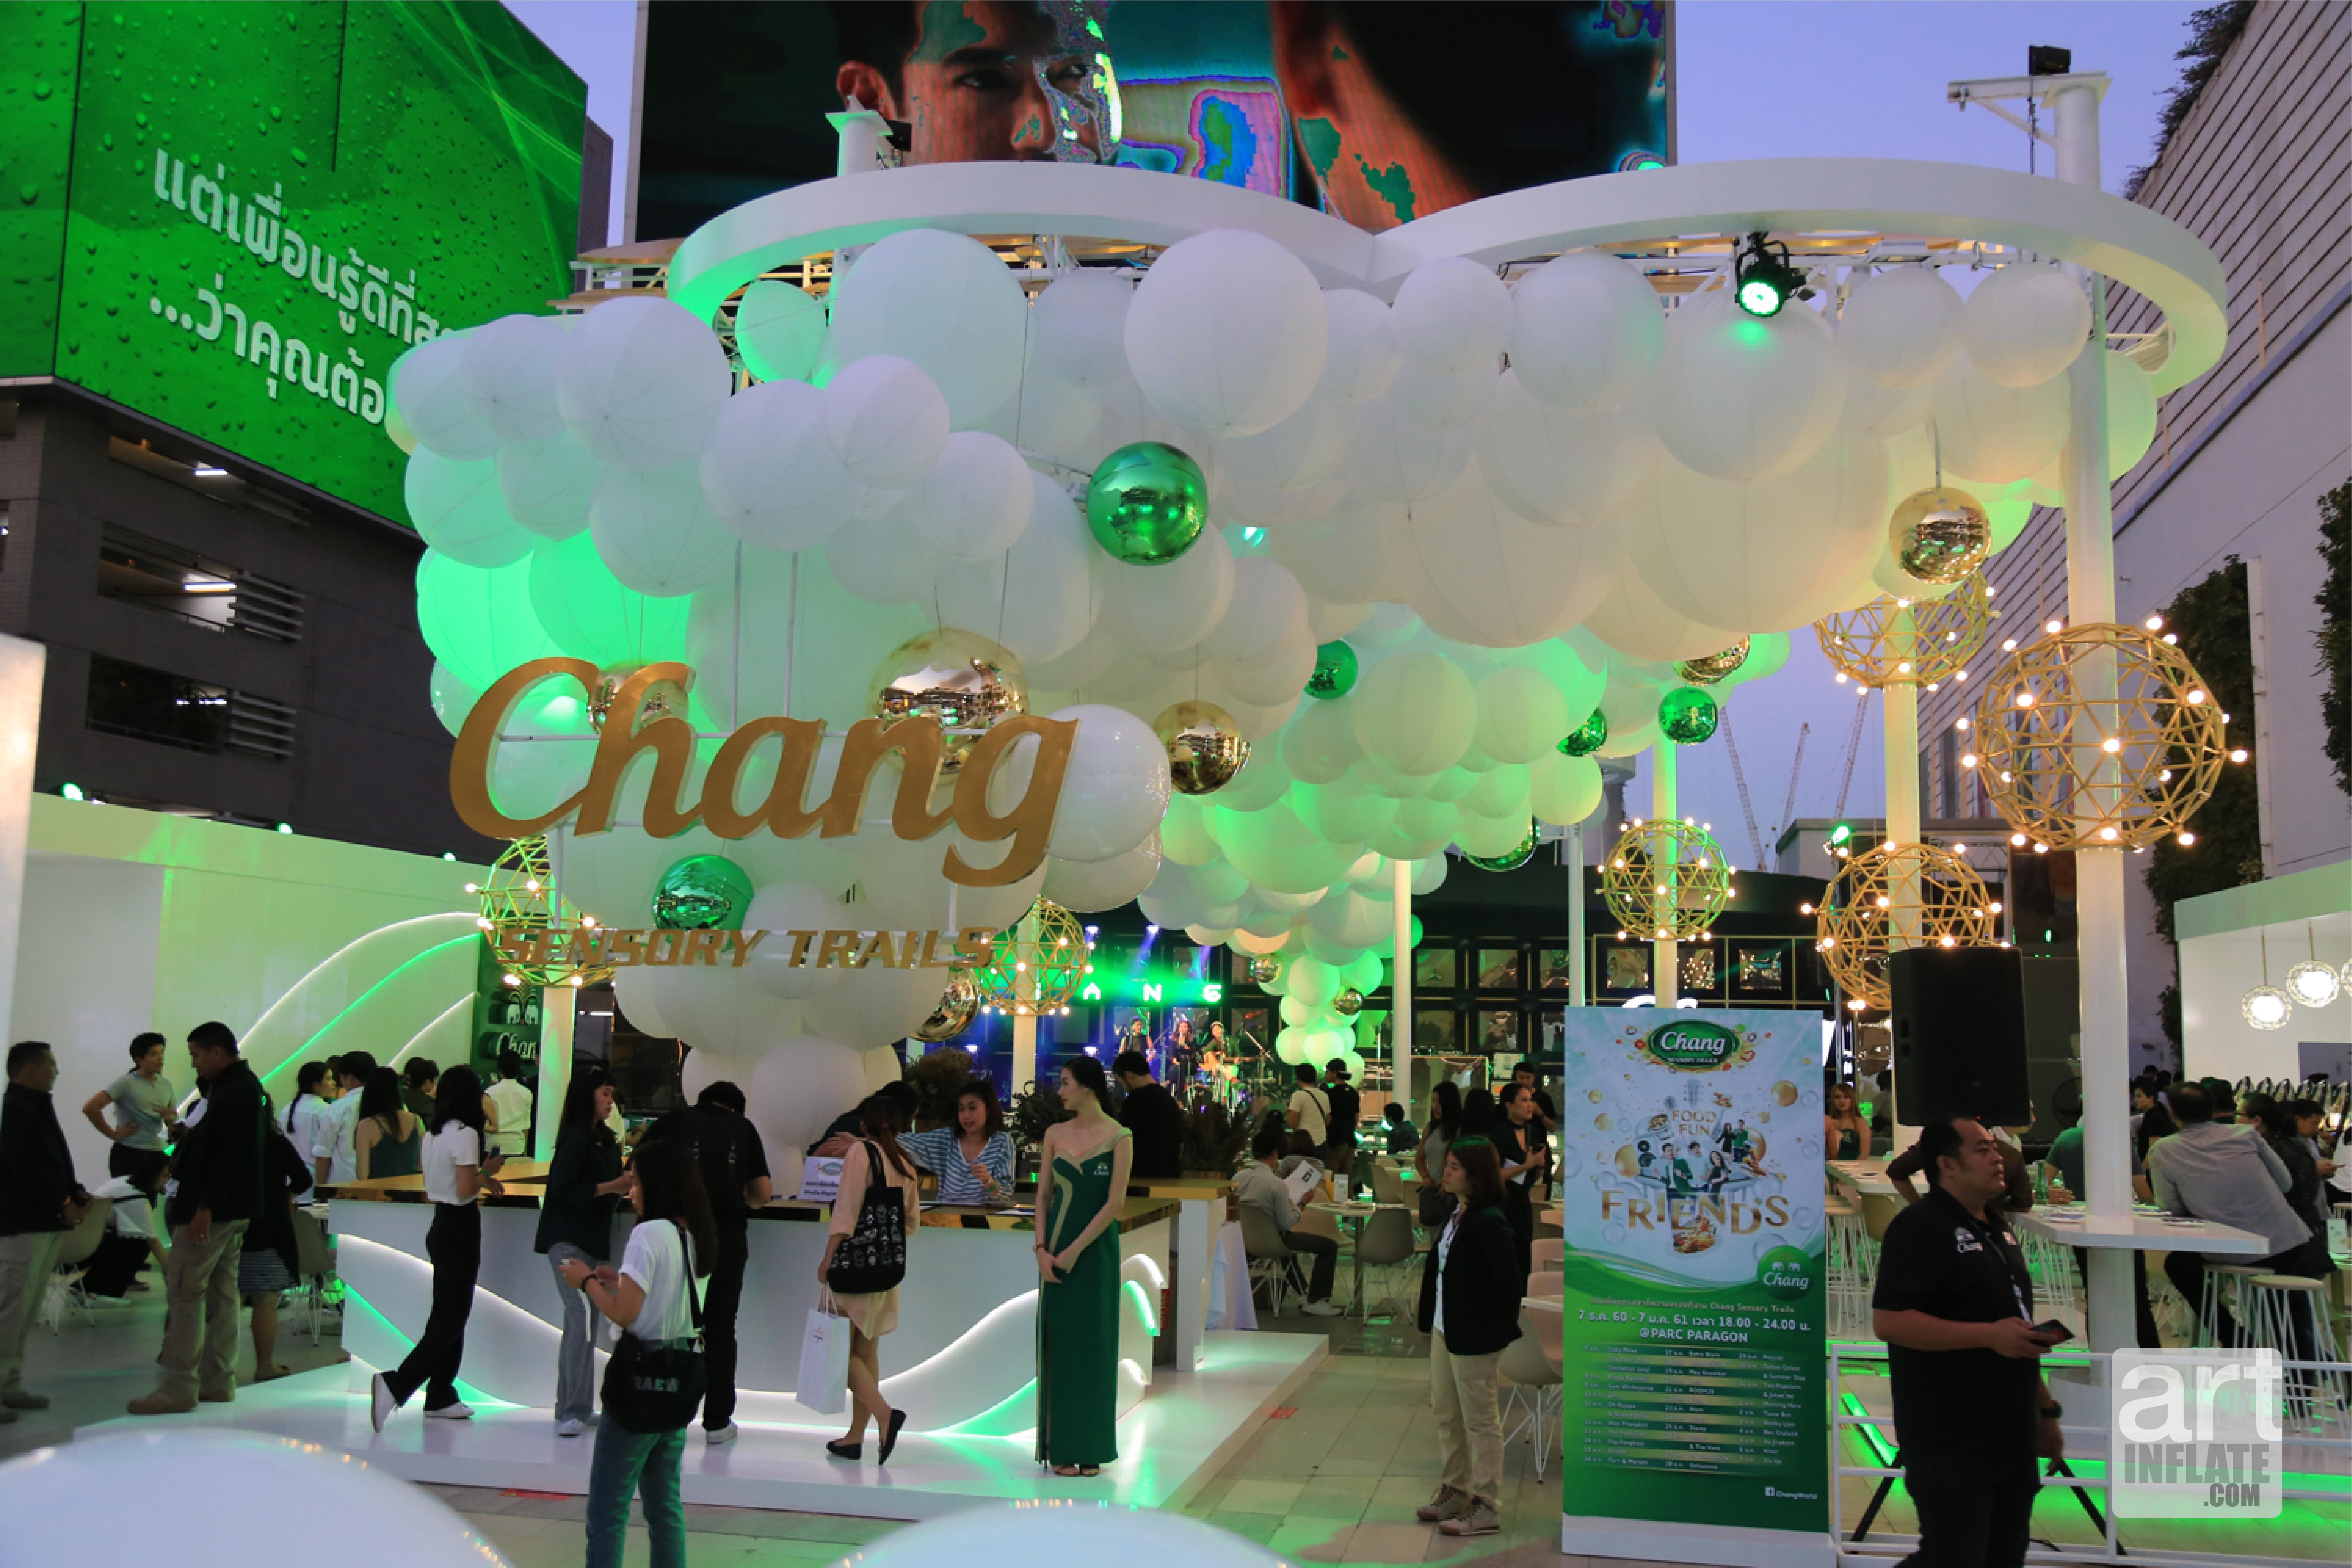 Chang Bubble Balloon